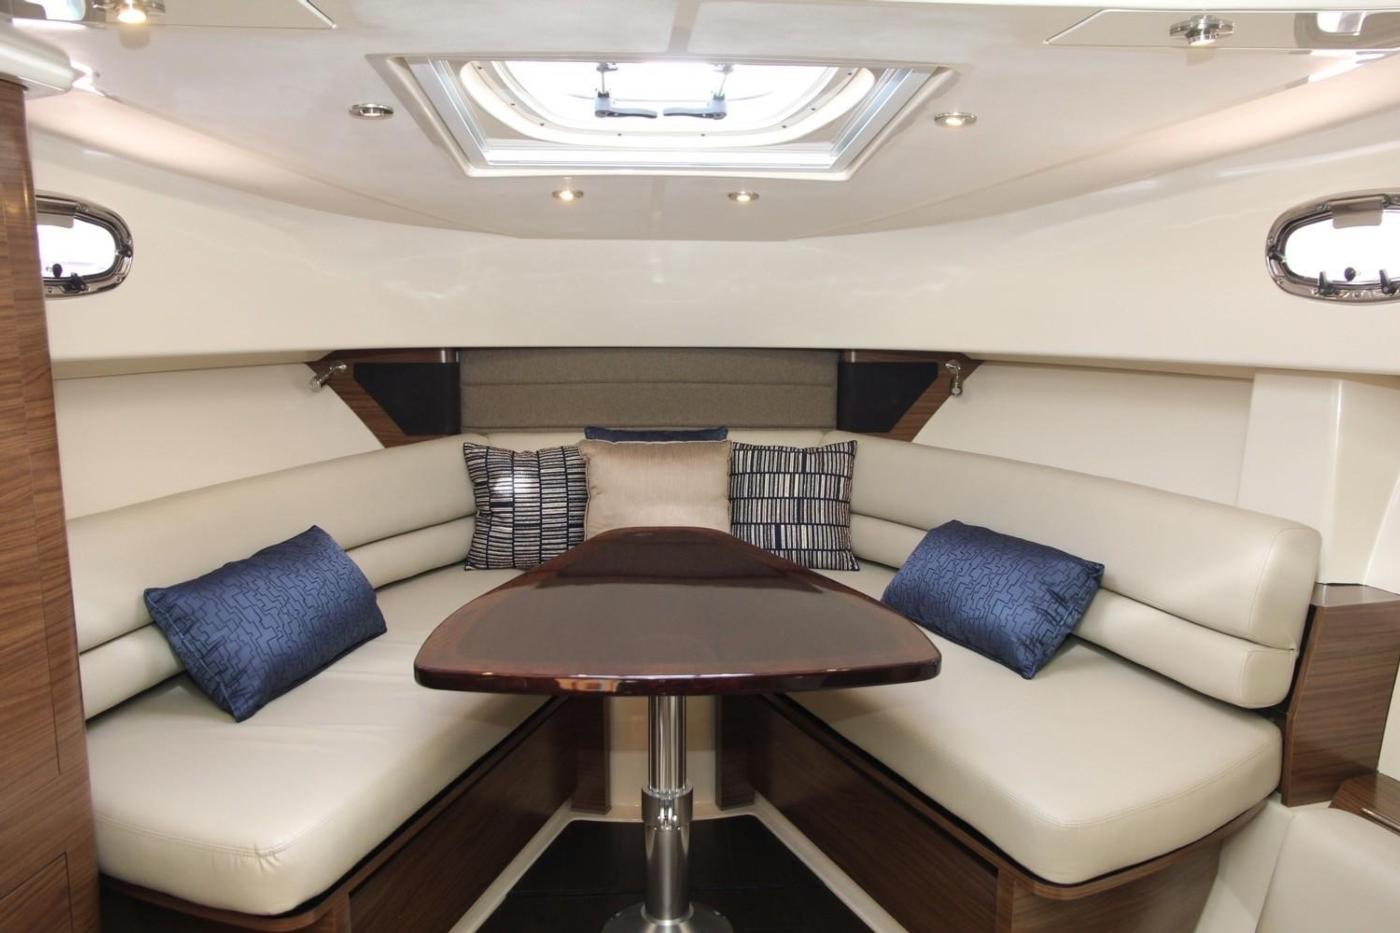 2017 Boston Whaler 345 Conquest, Forward U-Shaped Dinette